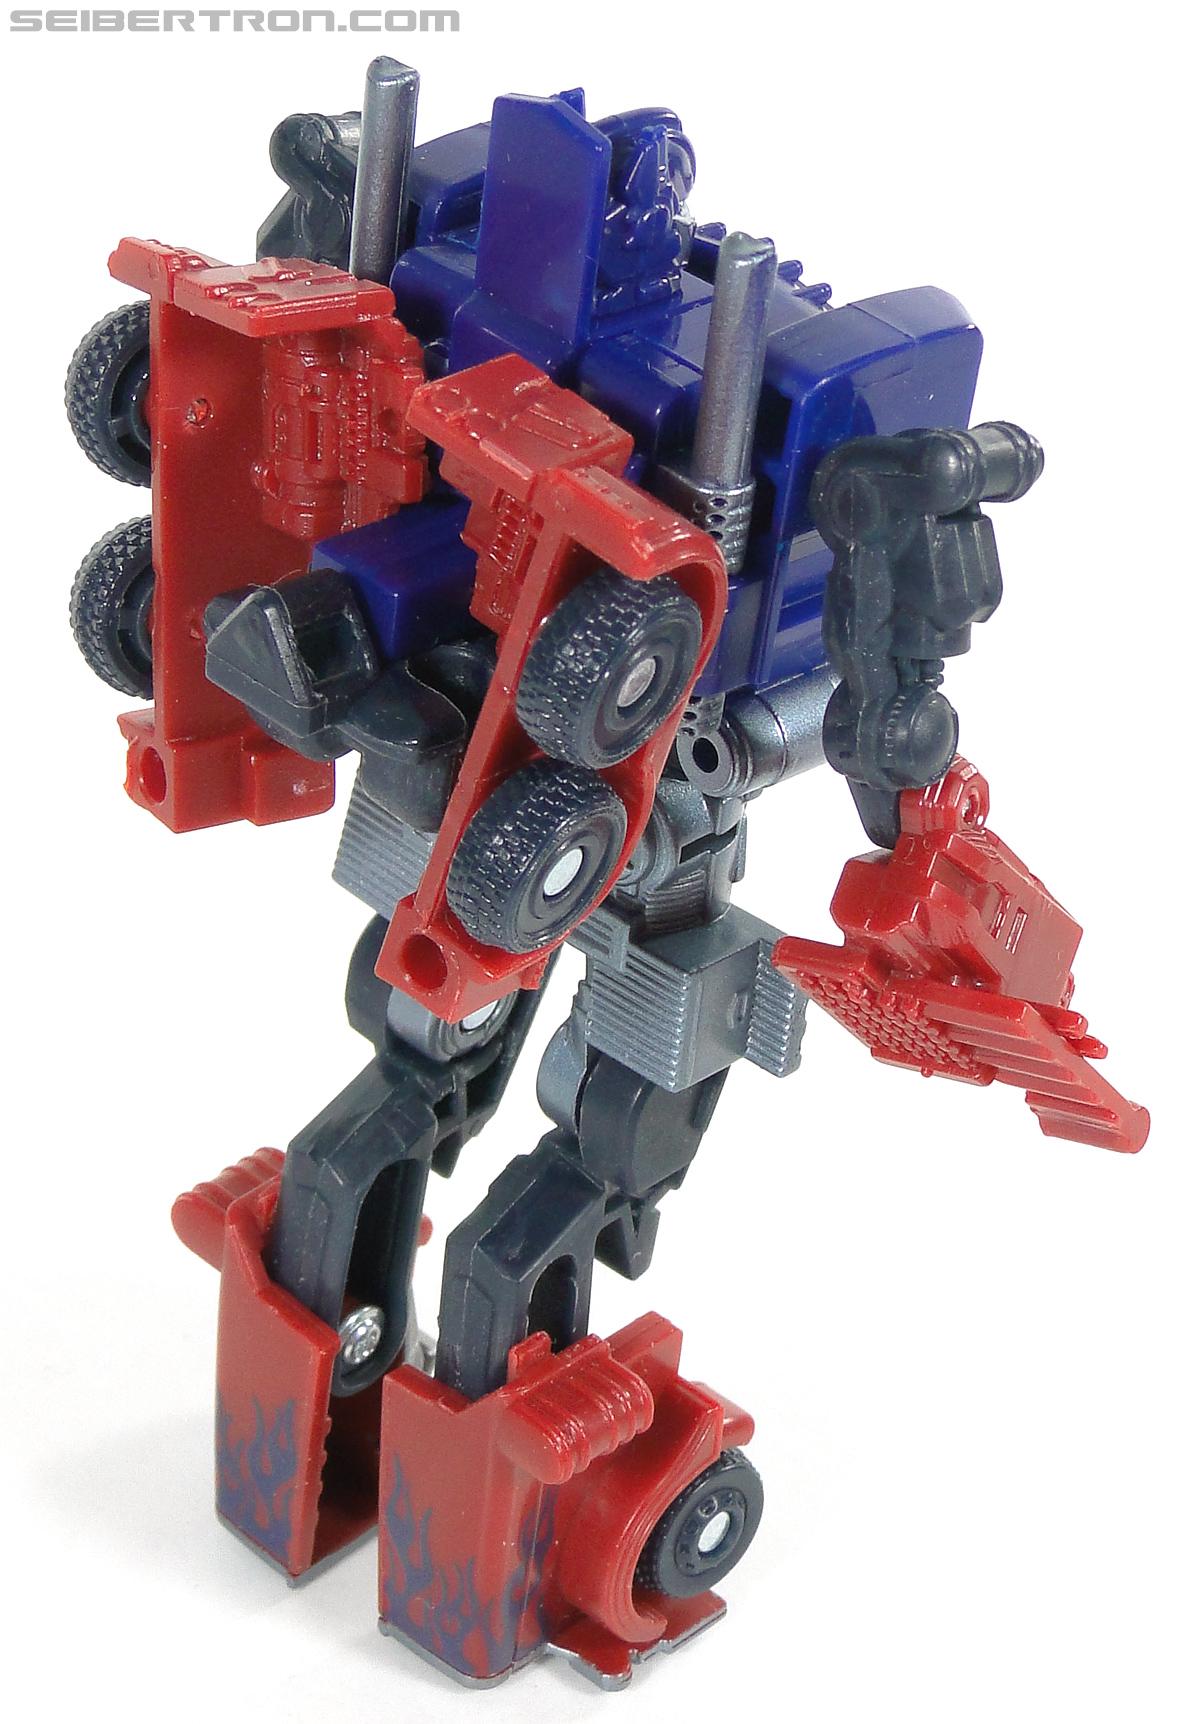 Transformers Dark of the Moon Optimus Prime (Image #116 of 235)